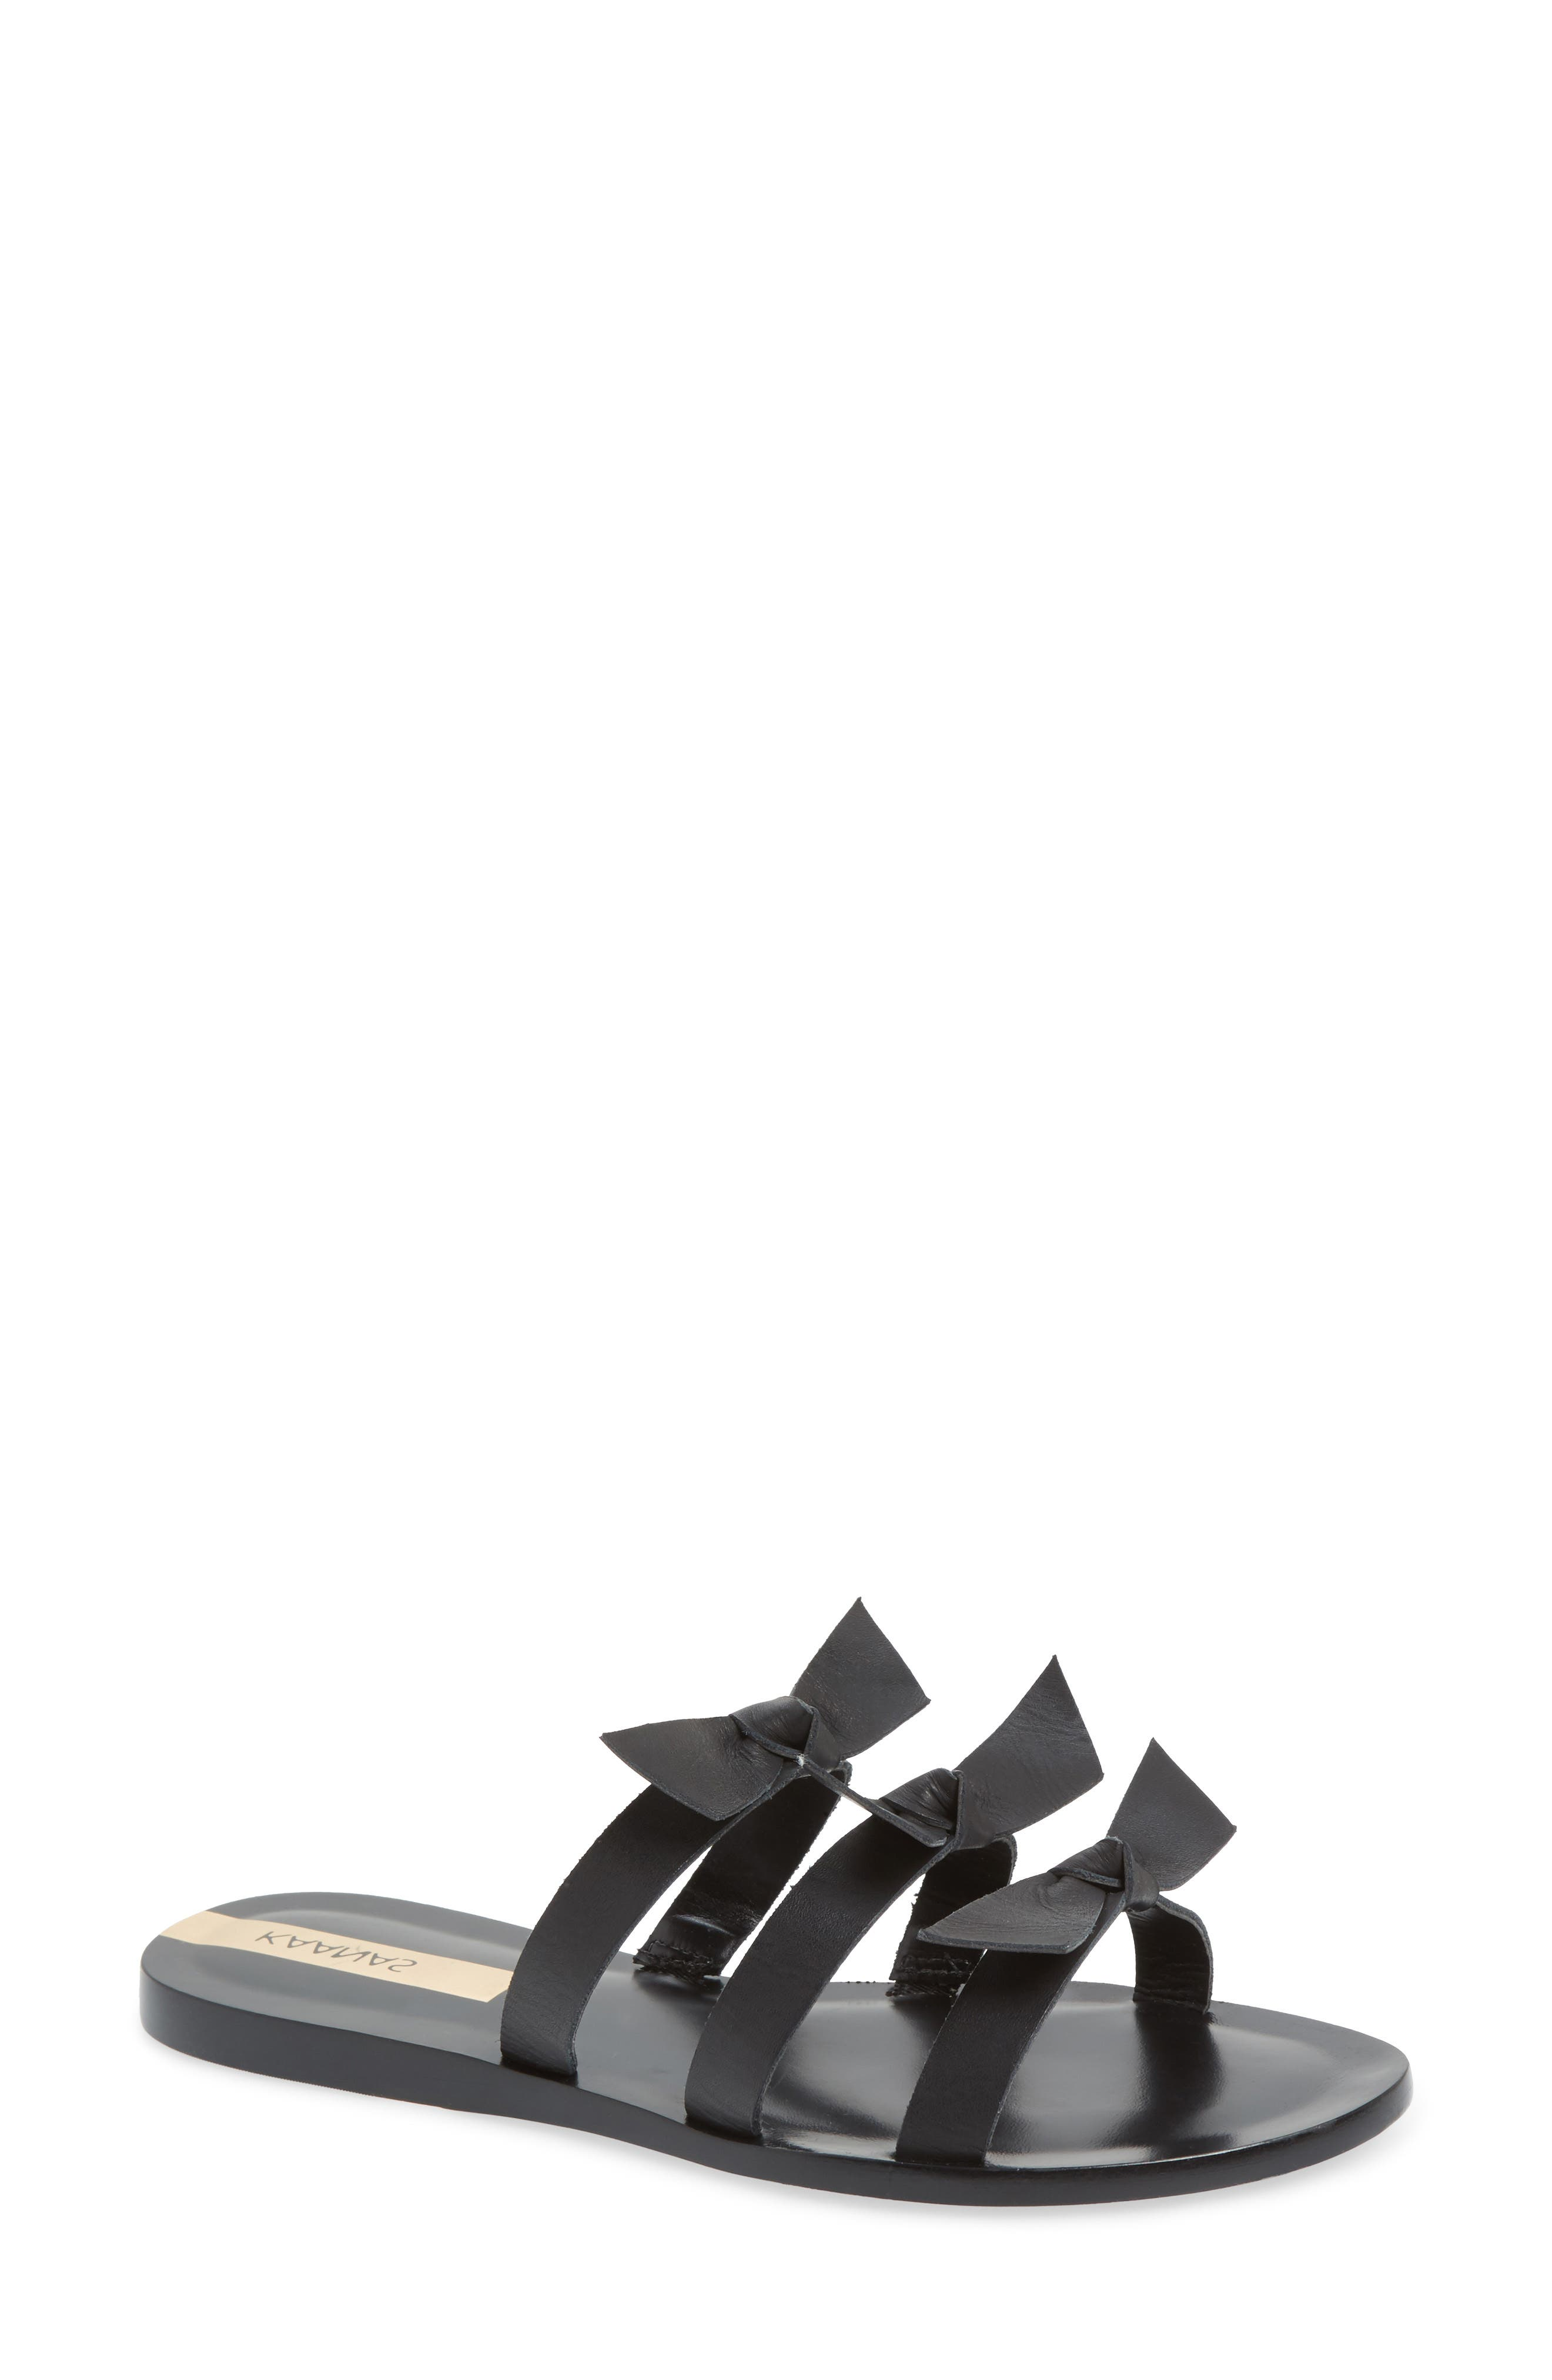 Recife Knotted Slide Sandal,                             Main thumbnail 1, color,                             Black